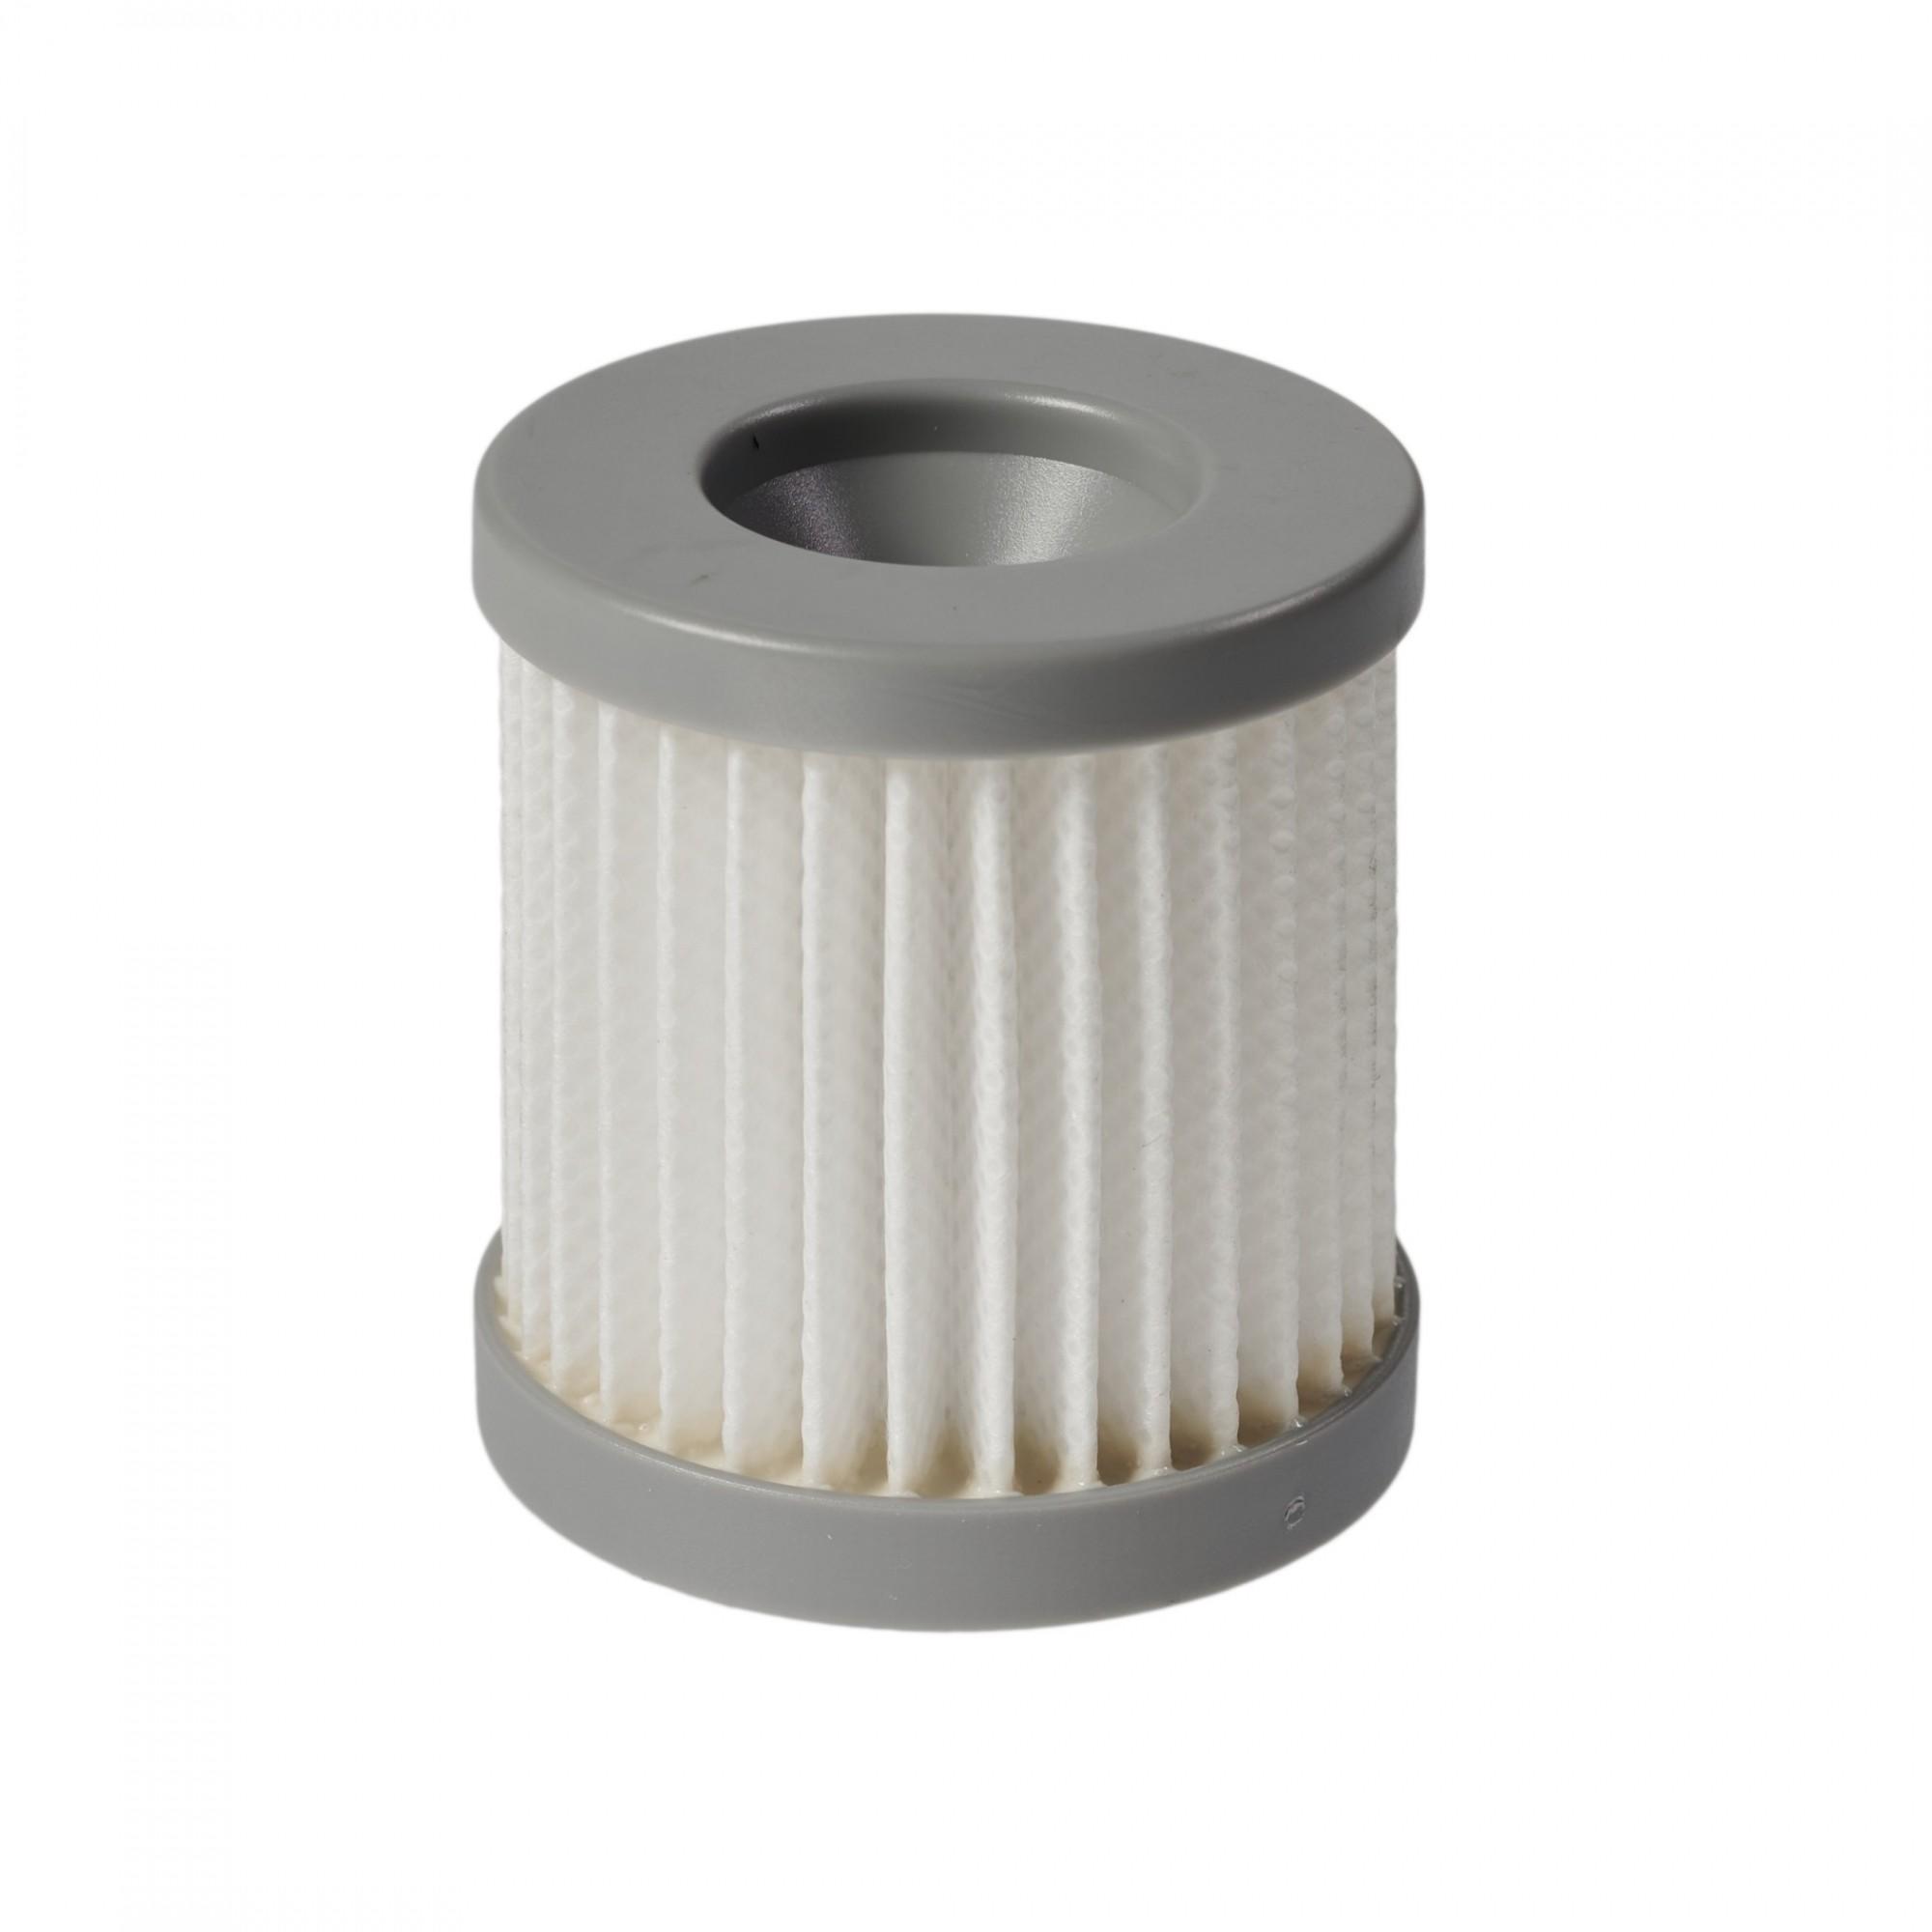 Filtro Hepa Permanente Lavável para Aspirador Mite Cleaner UV - WAP